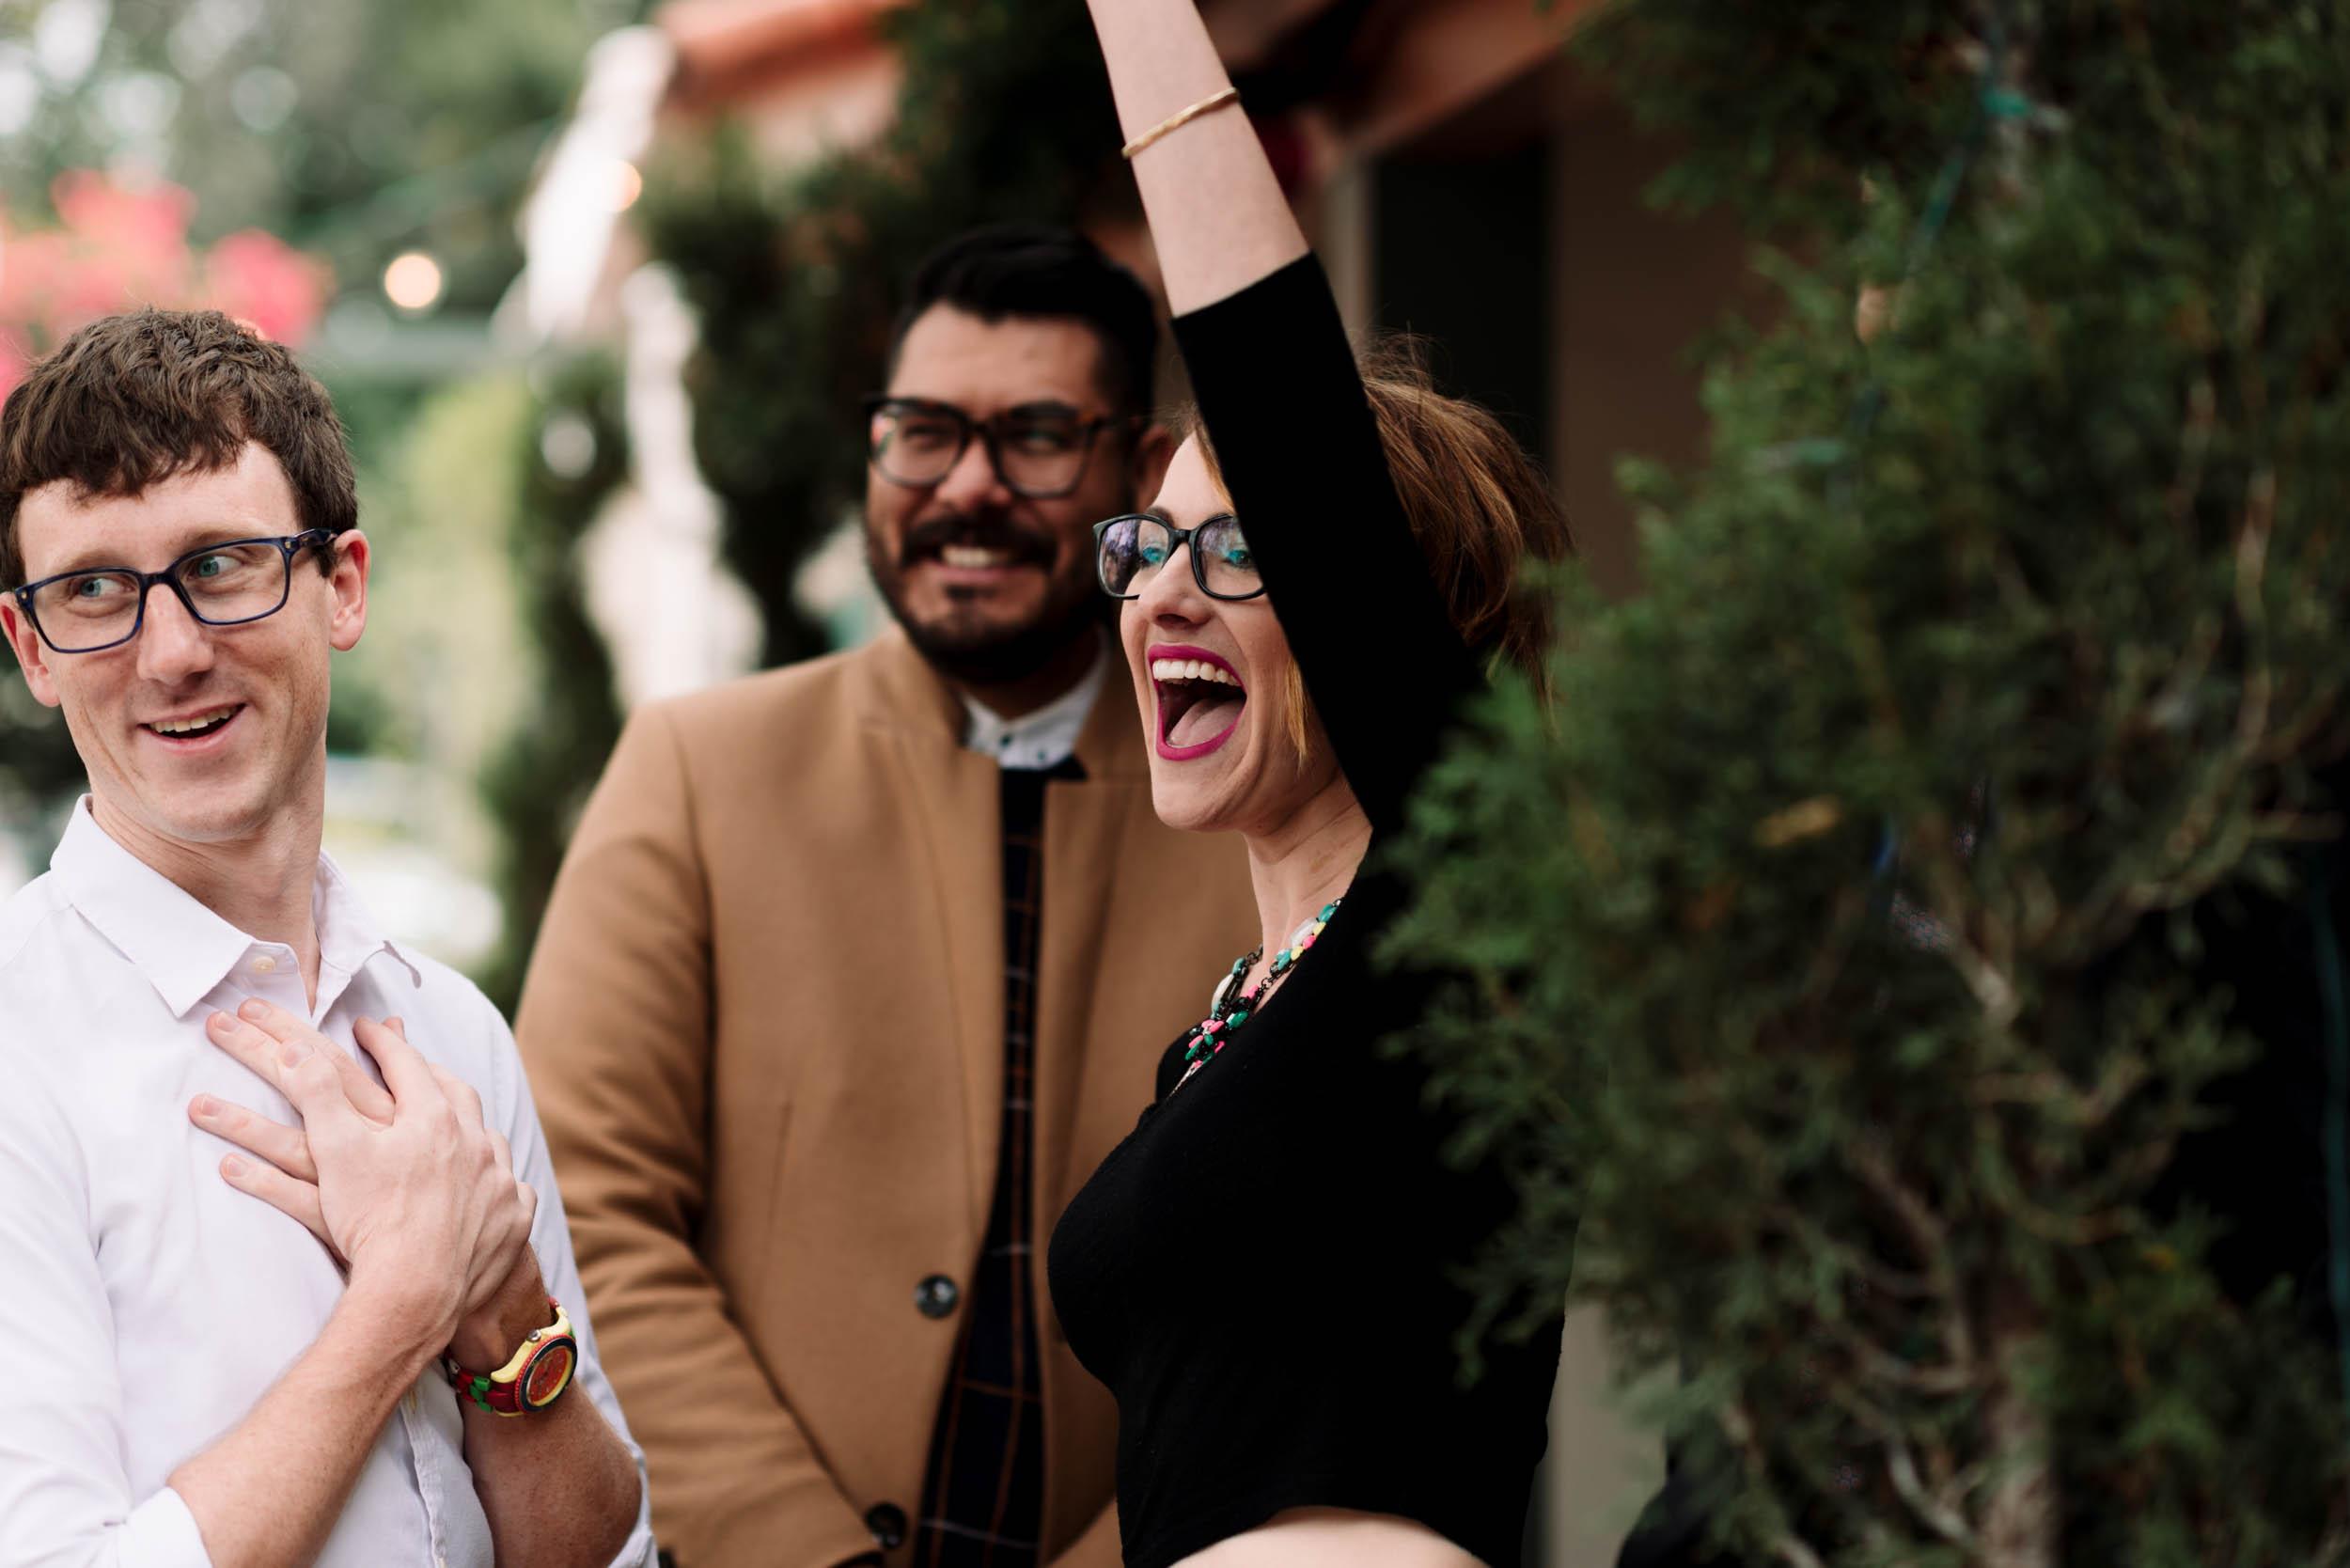 Desination_Wedding_Los Angeles-1_belle&sass.jpg